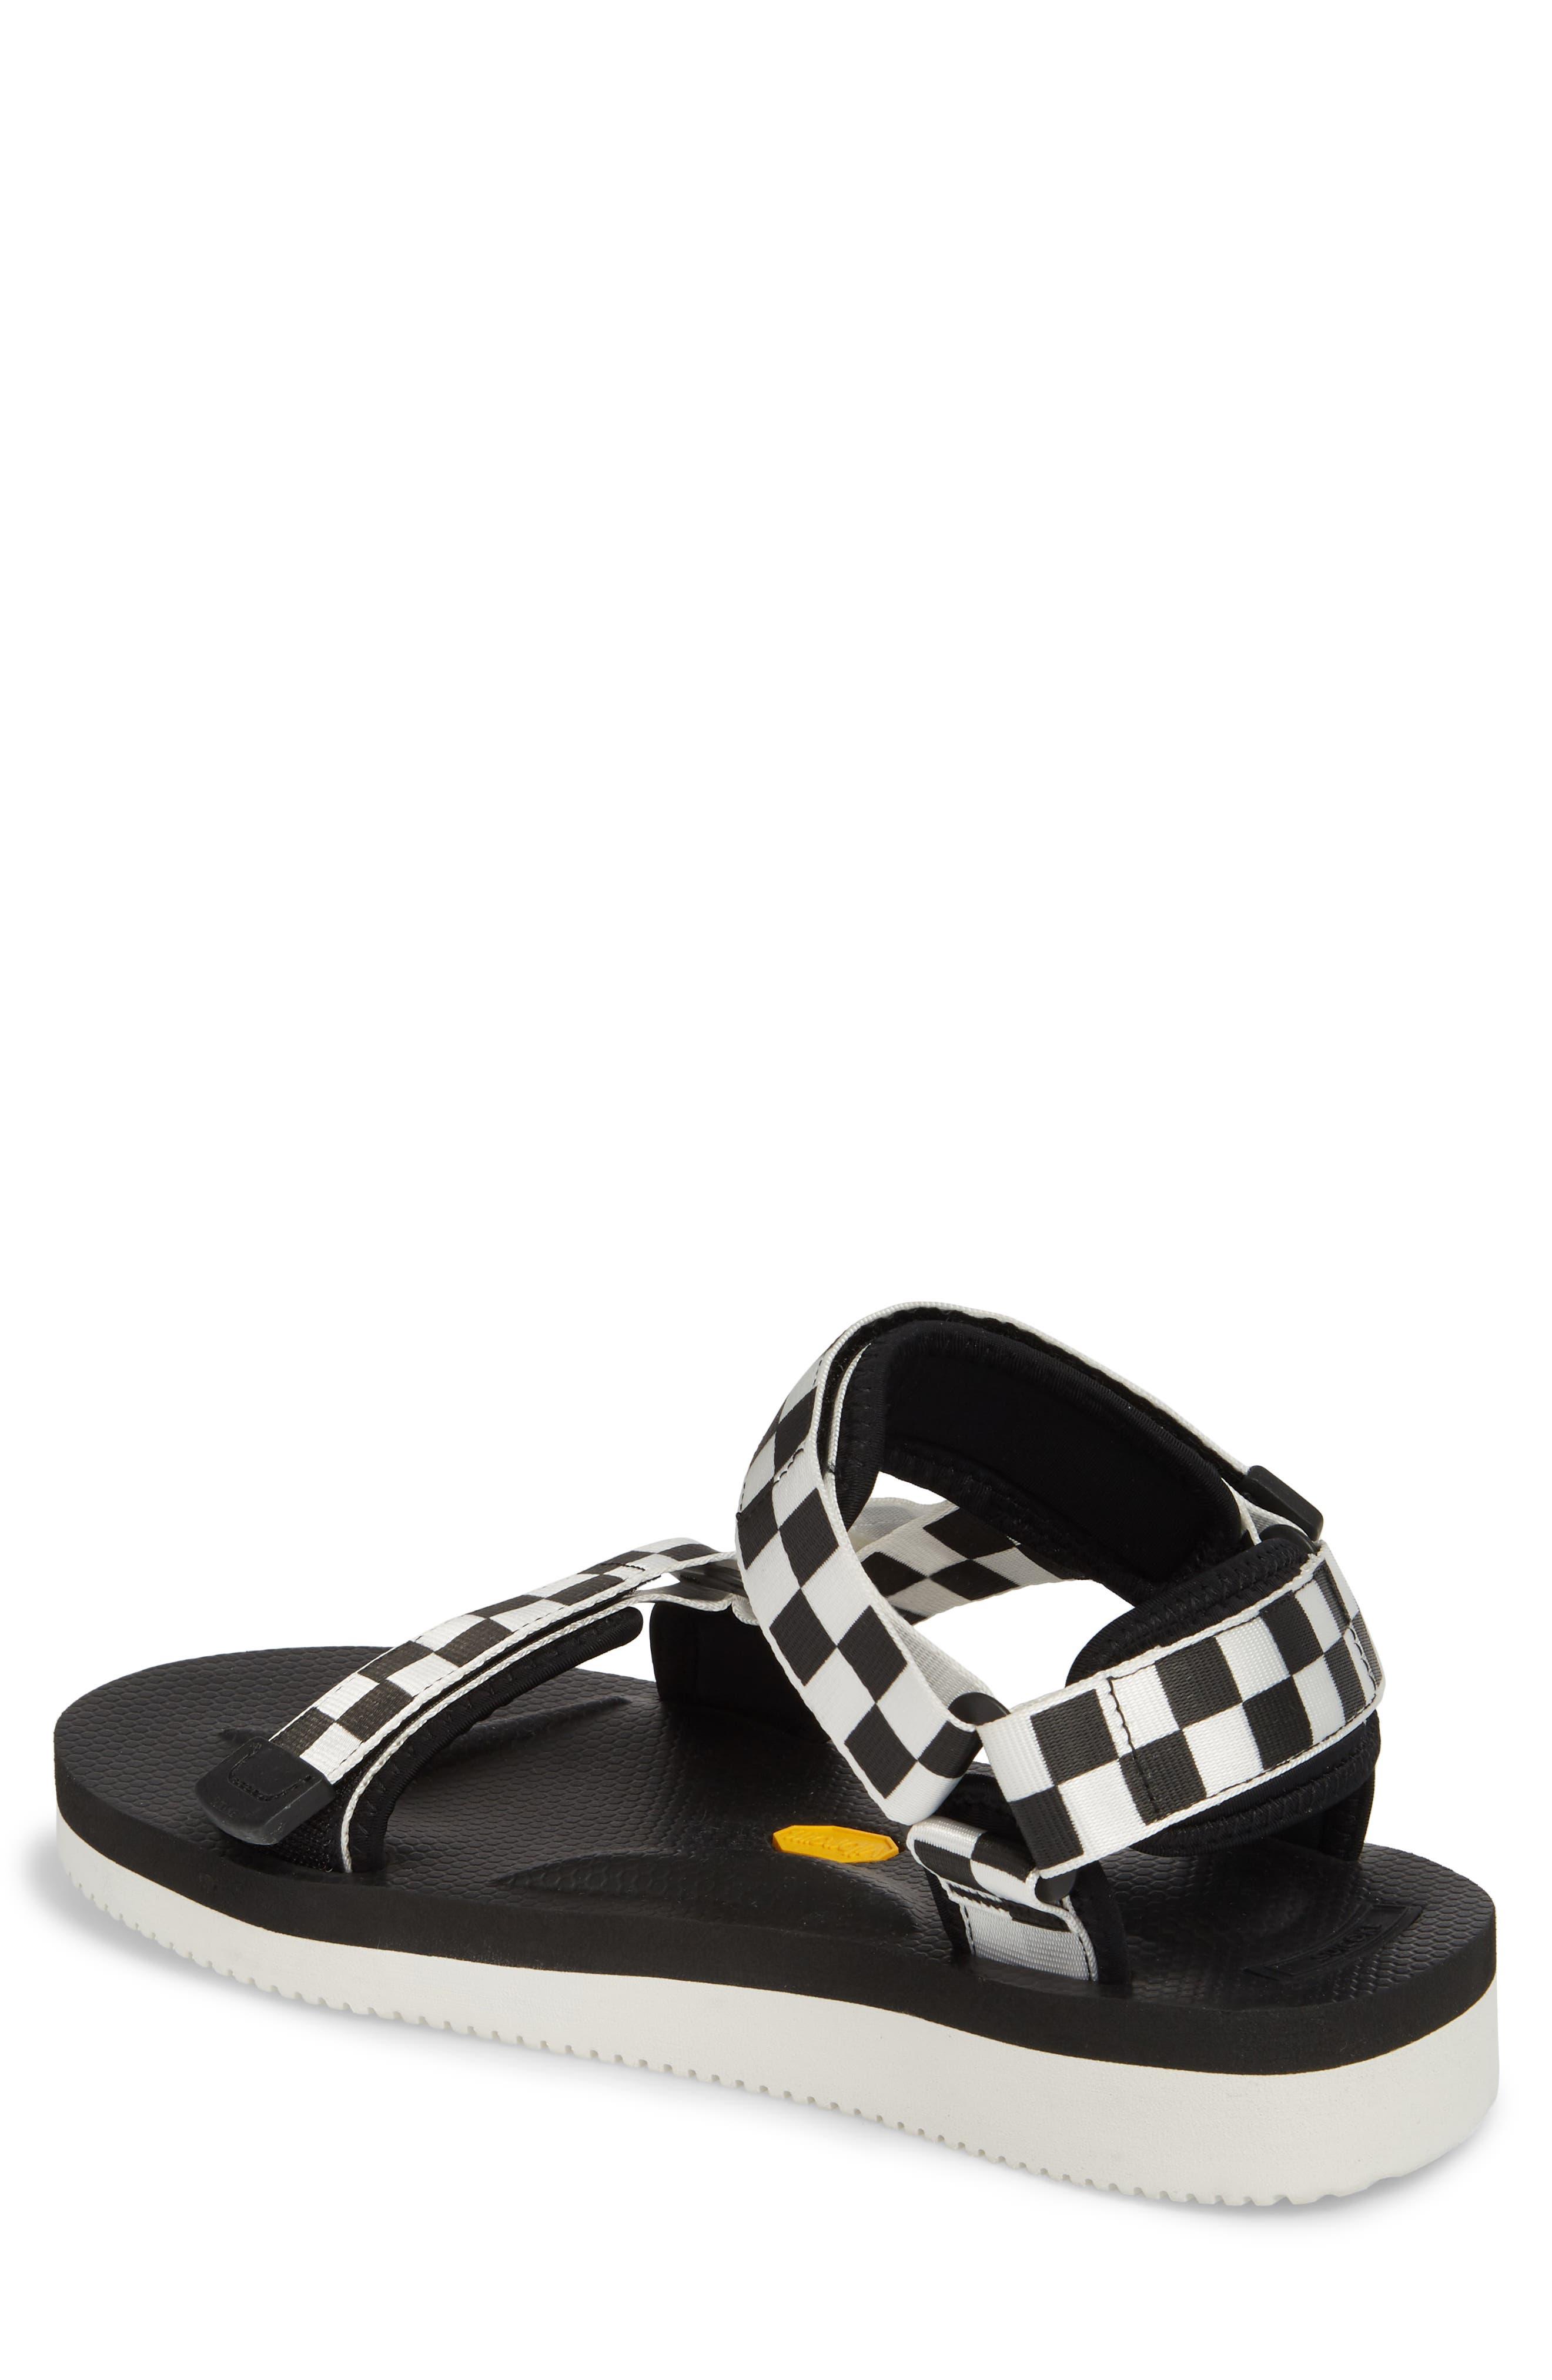 Depa Sport Sandal,                             Alternate thumbnail 2, color,                             BLACK